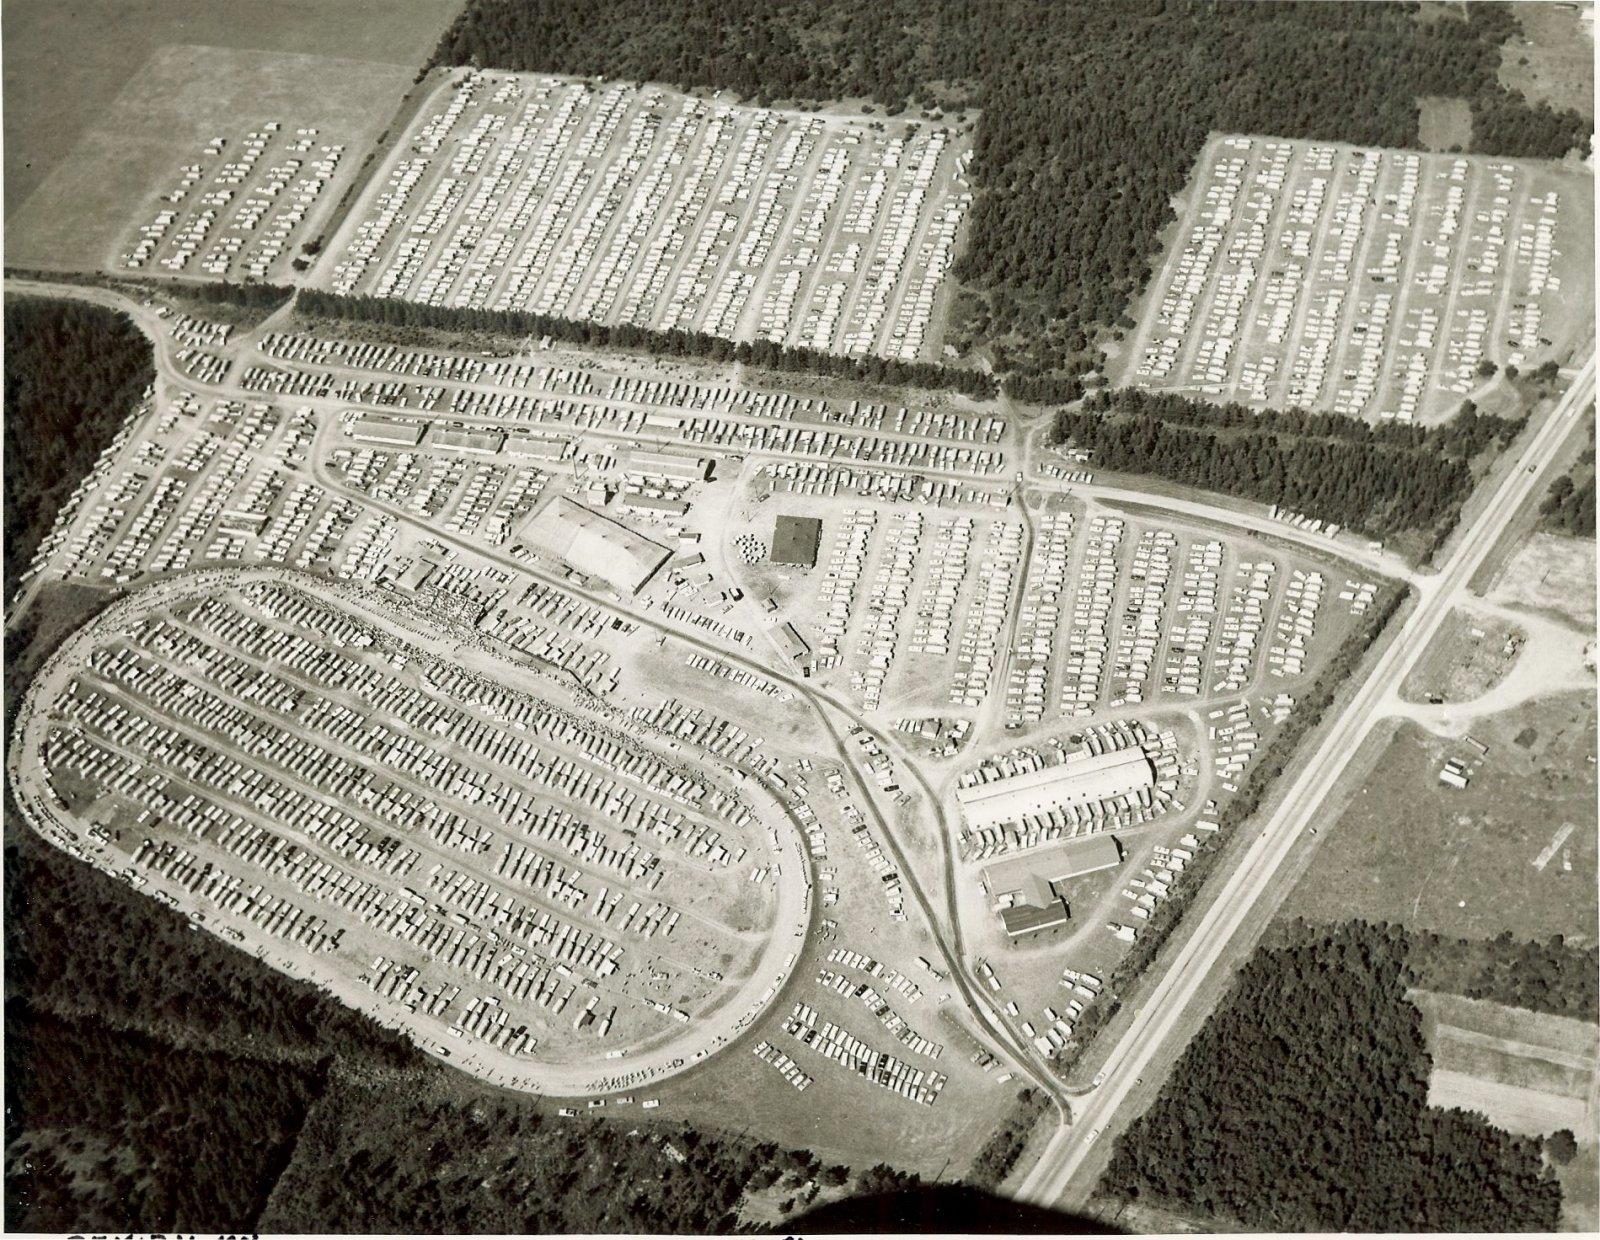 Click image for larger version  Name:Bemidji 1963.jpg Views:134 Size:557.4 KB ID:116929